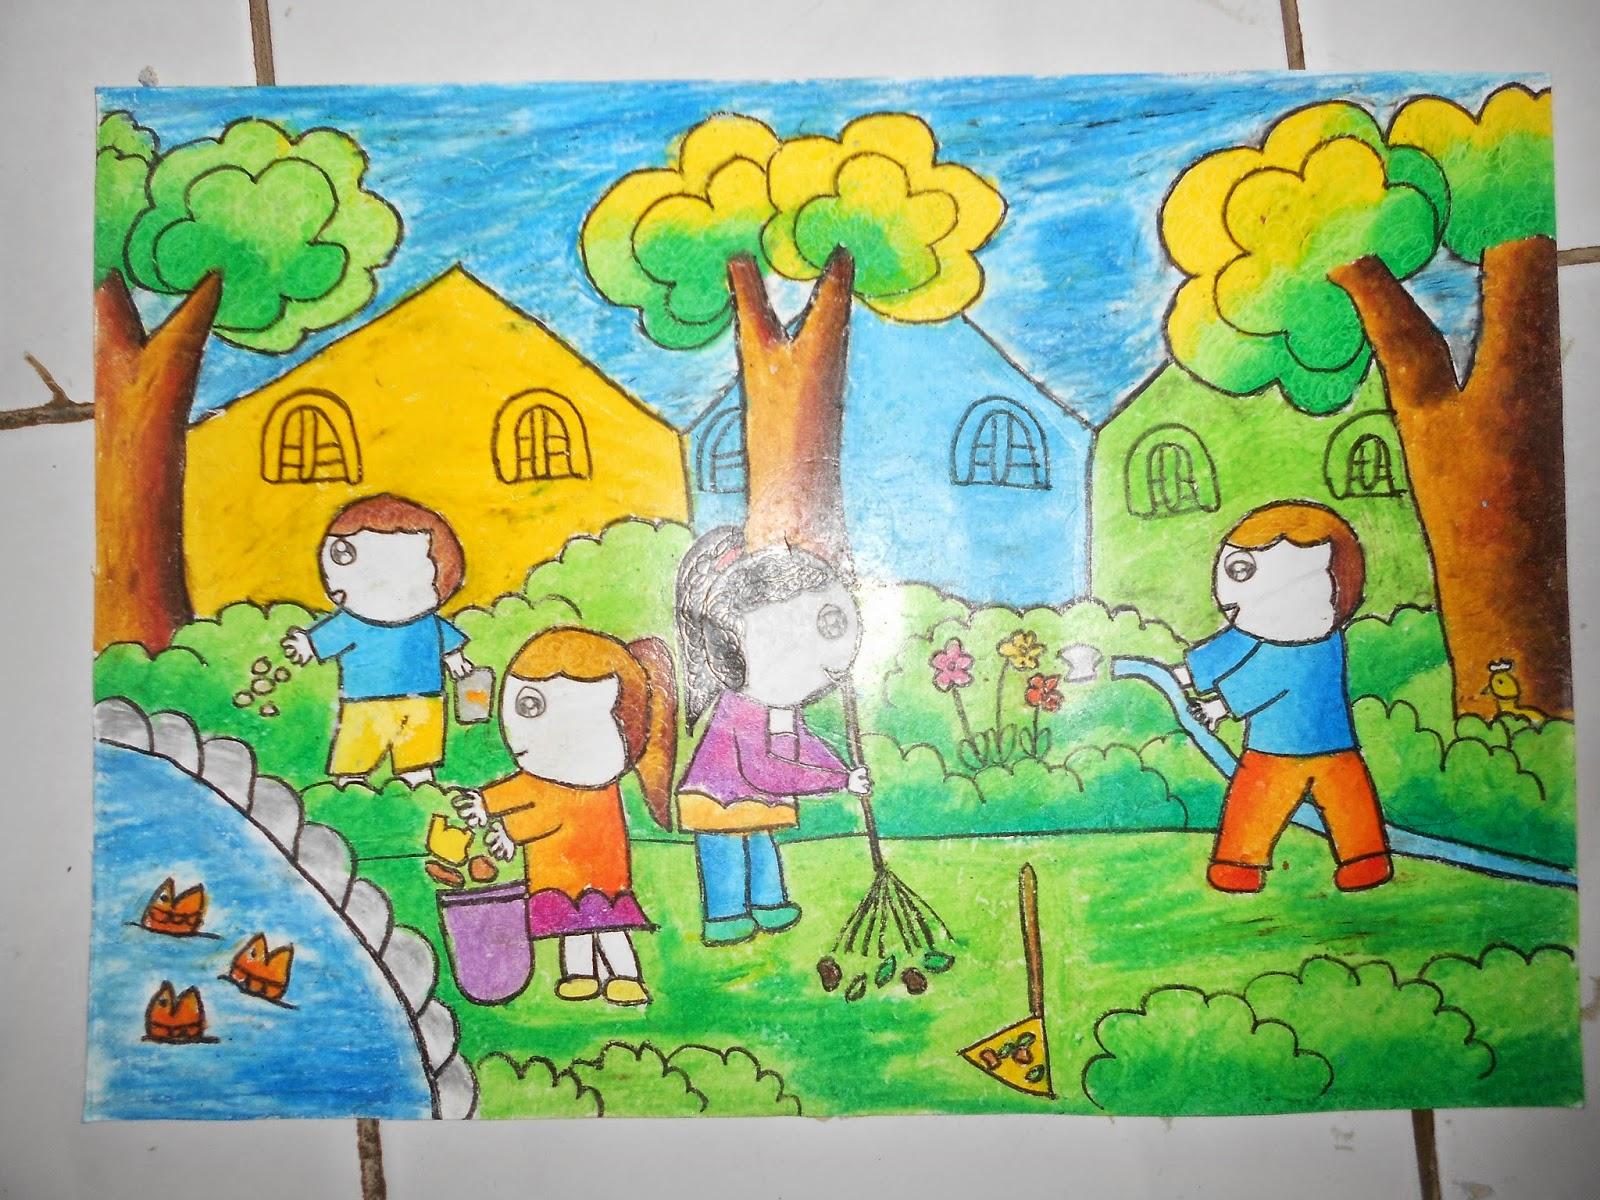 Gambar Ilustrasi Tema Lingkungan Sekolah